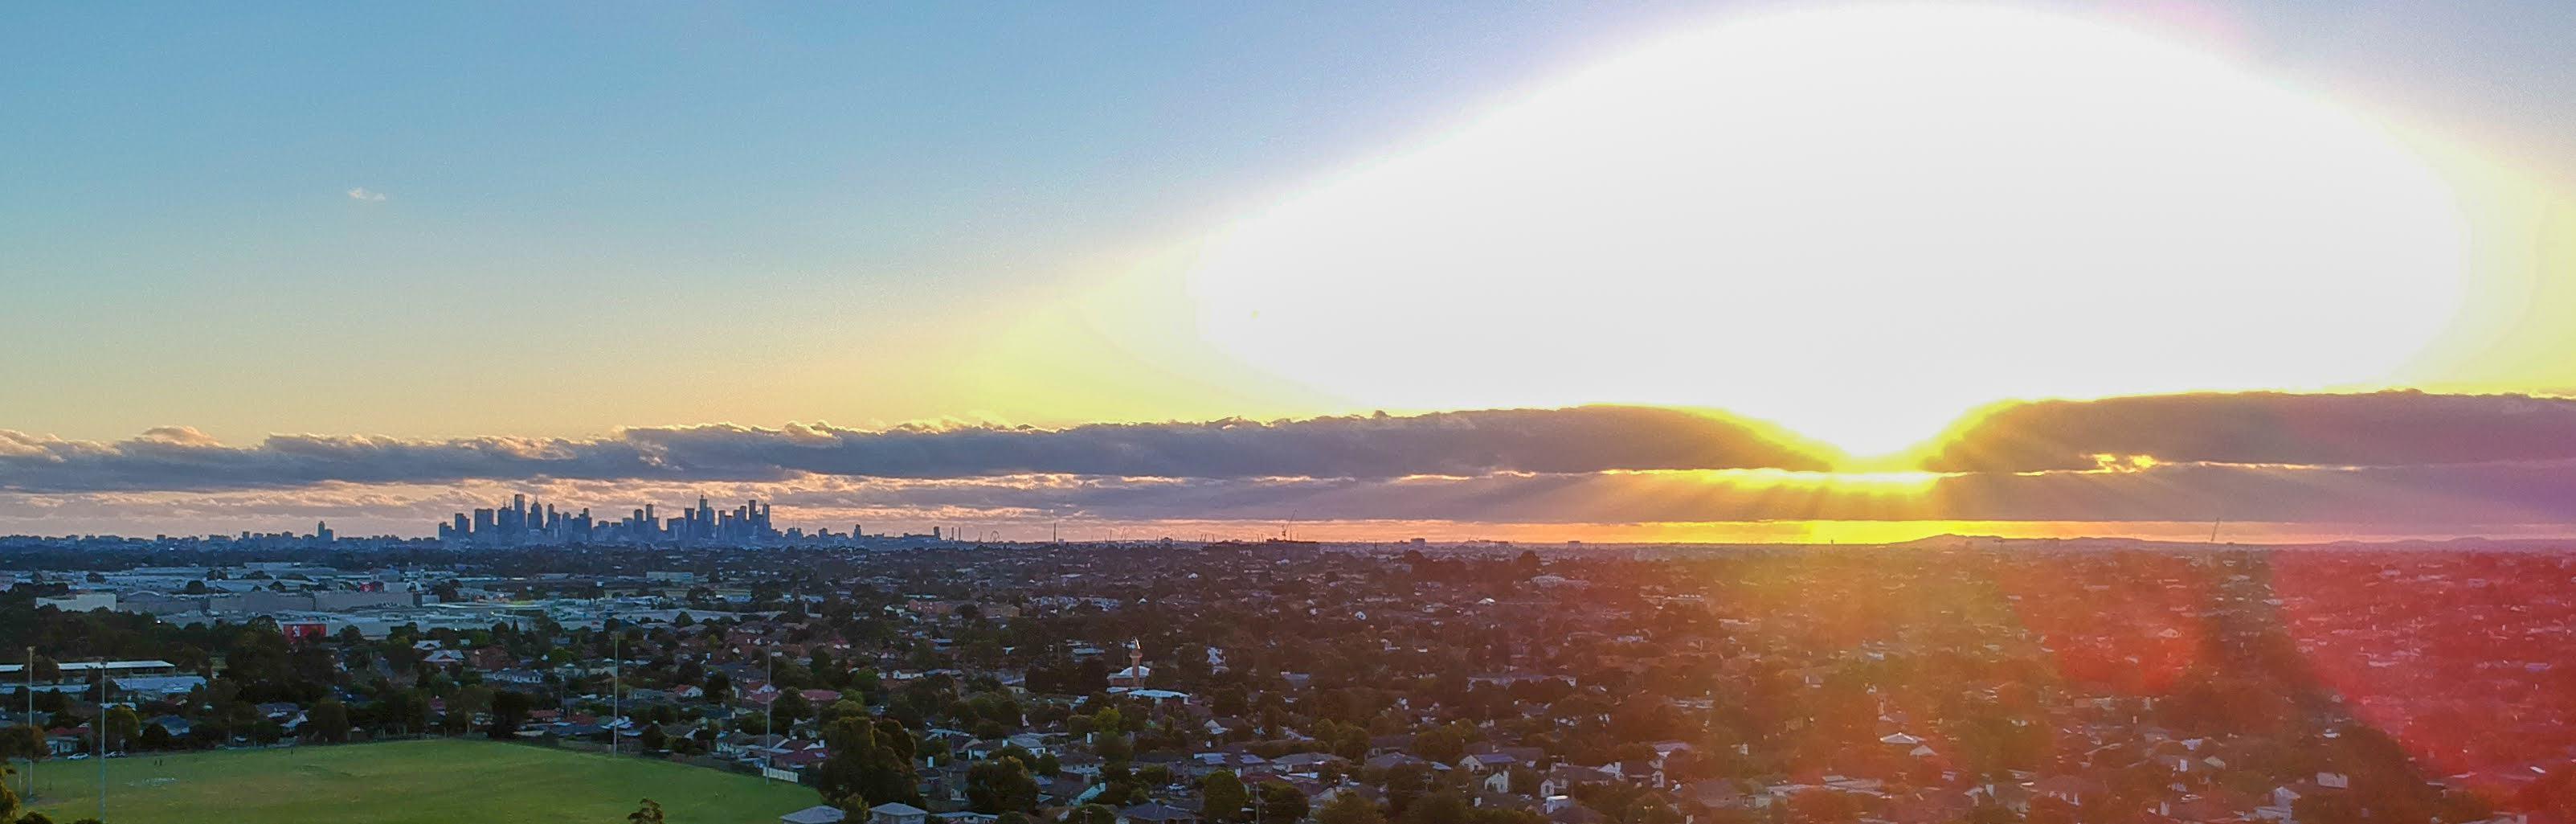 Spark Sunset-3.jpg